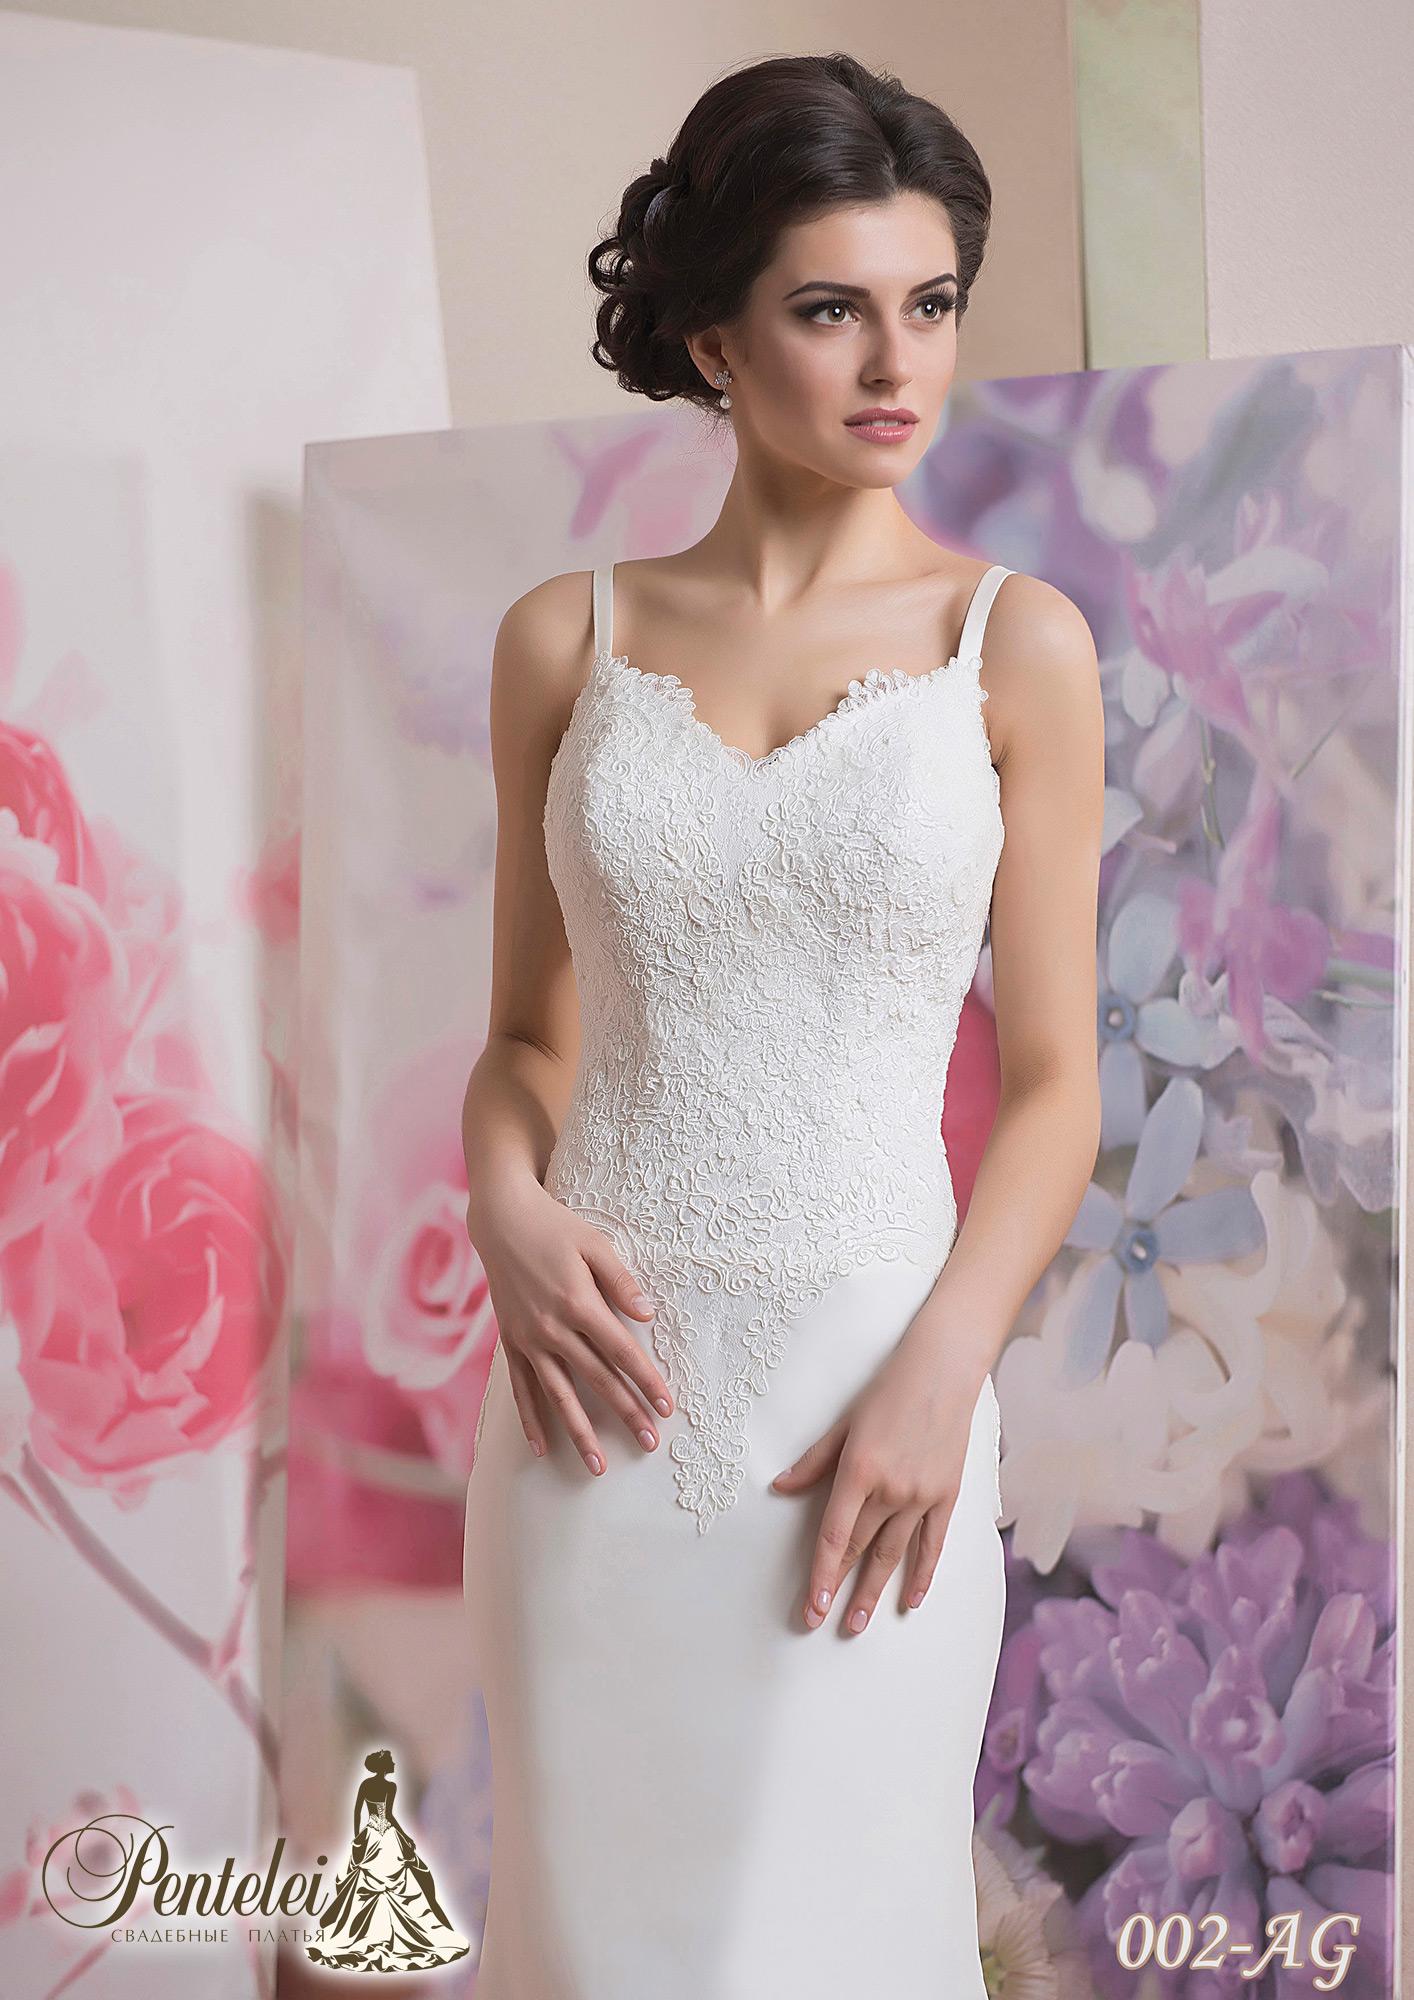 002-AG | Cumpăra rochii de mireasă en-gros de Pentelei